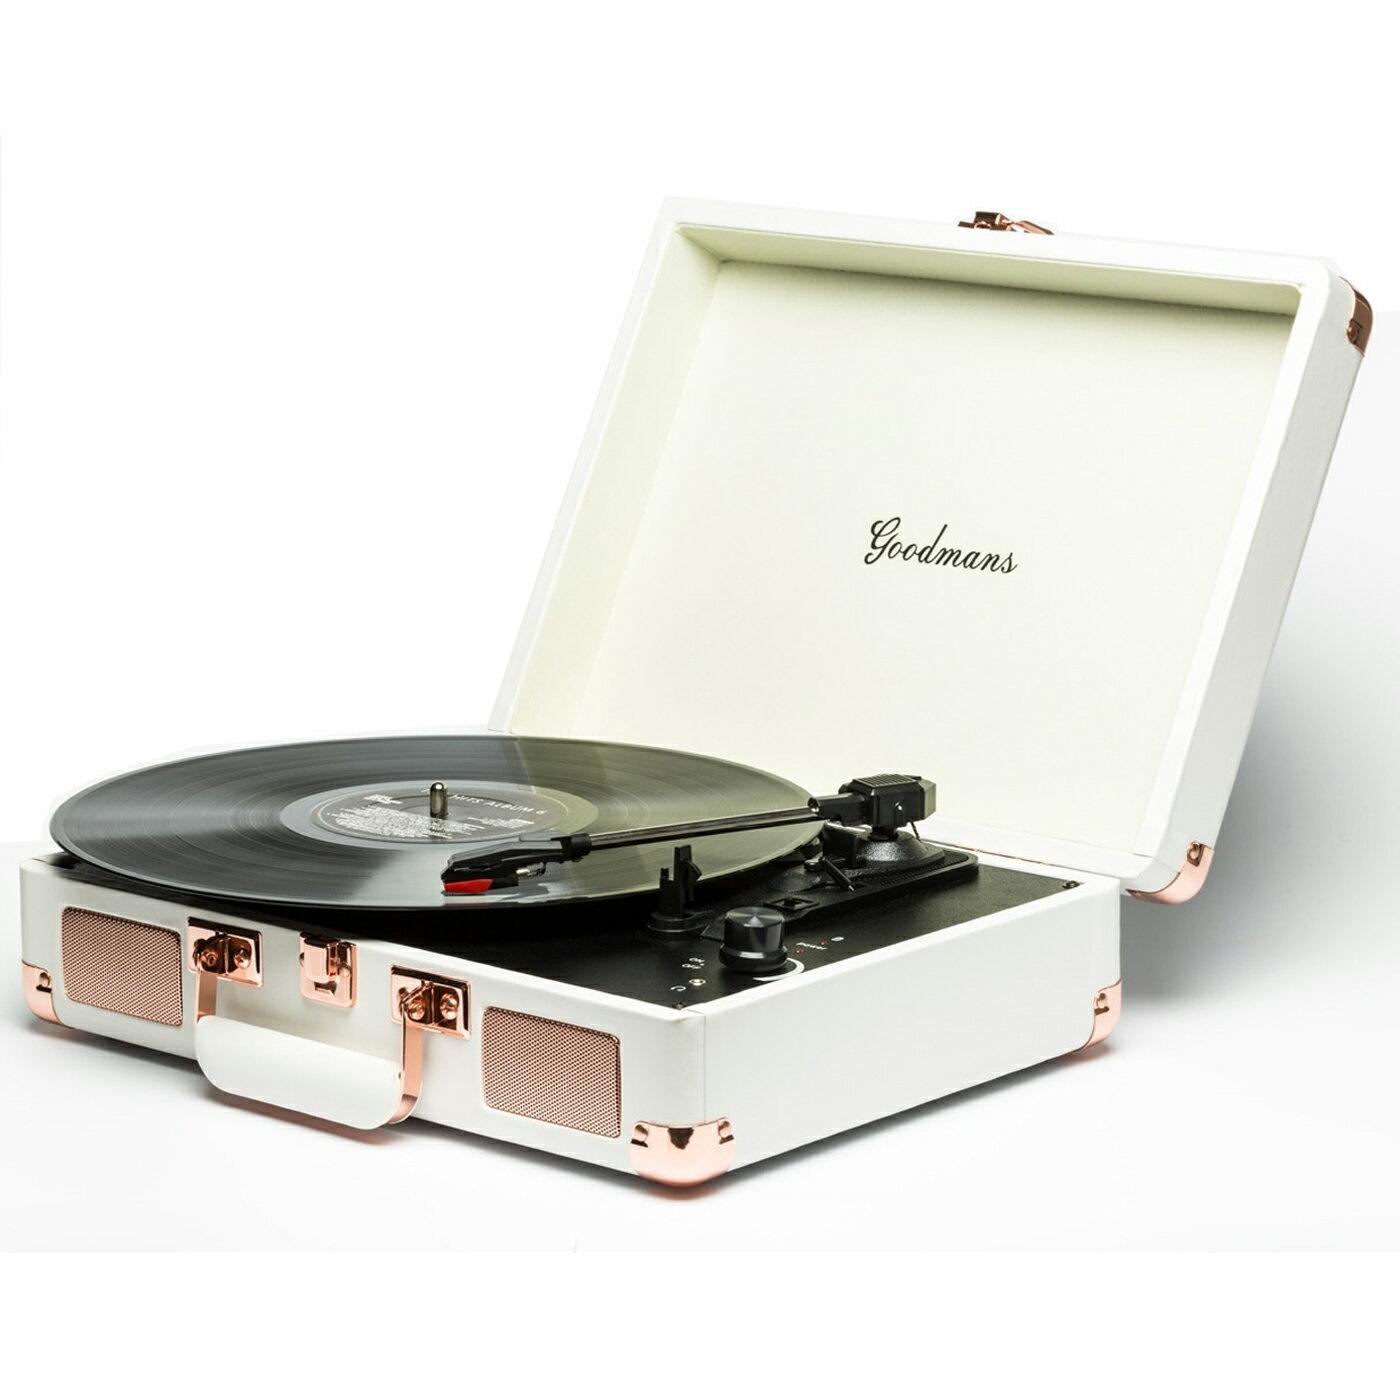 Goodmans Ealing Turntable 英國手提箱黑膠唱片機 0